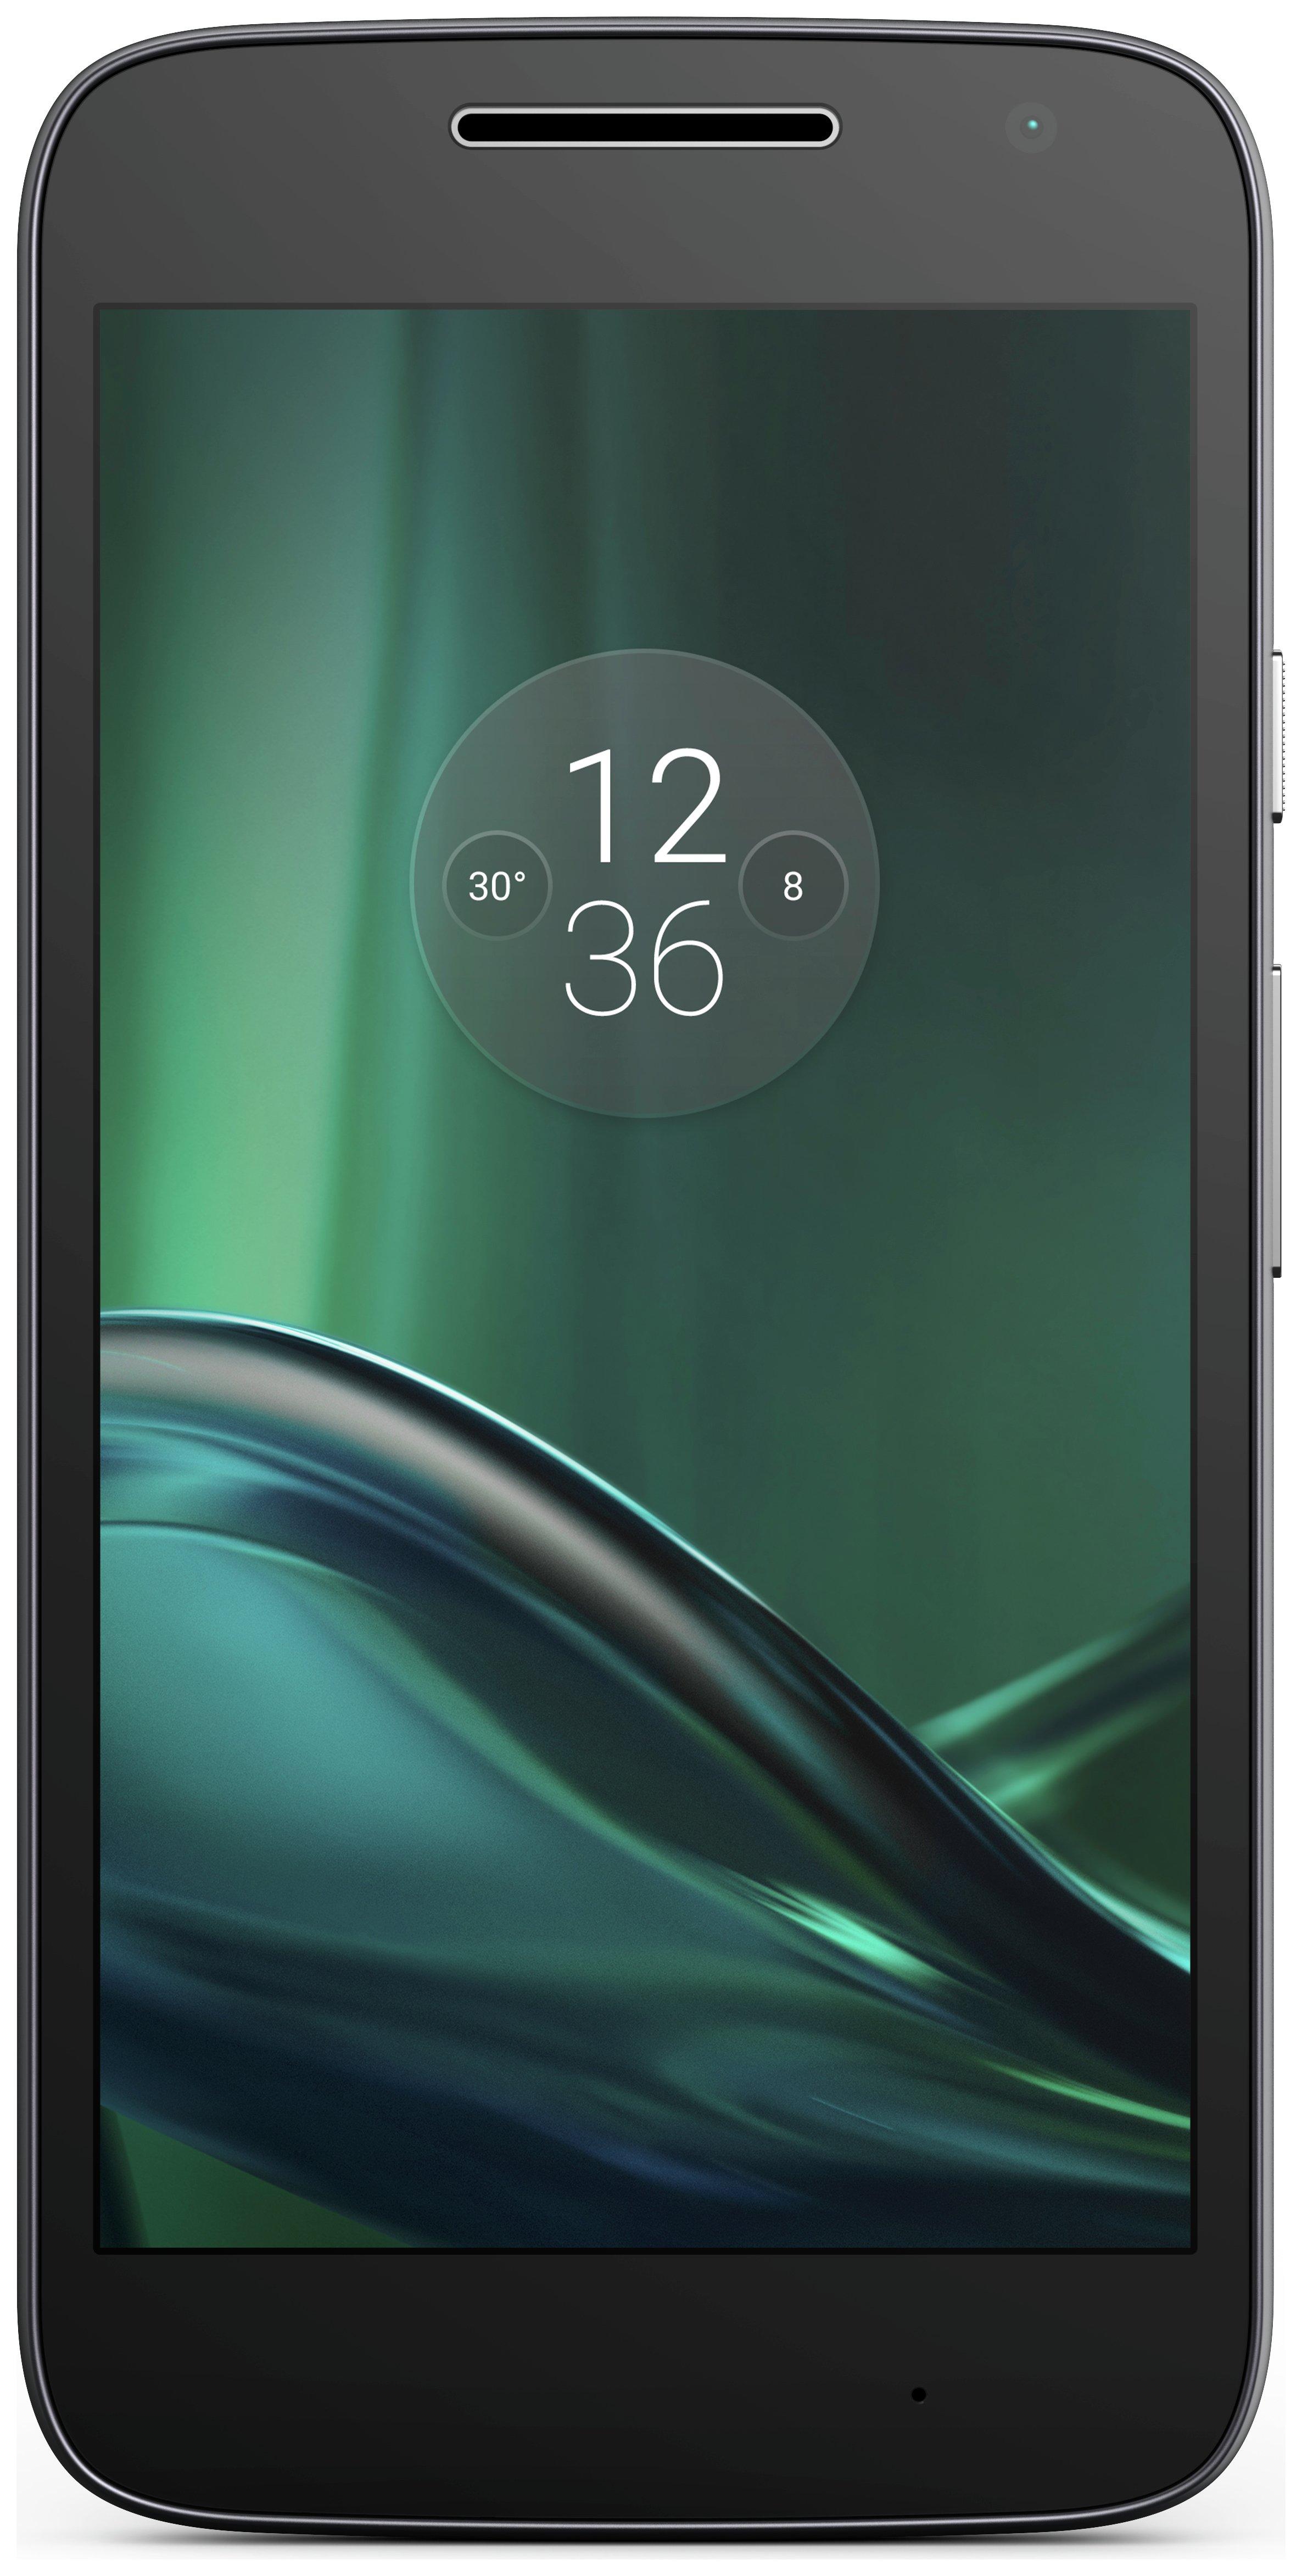 Motorola Sim Free Motorola Moto G4 Play- Black.